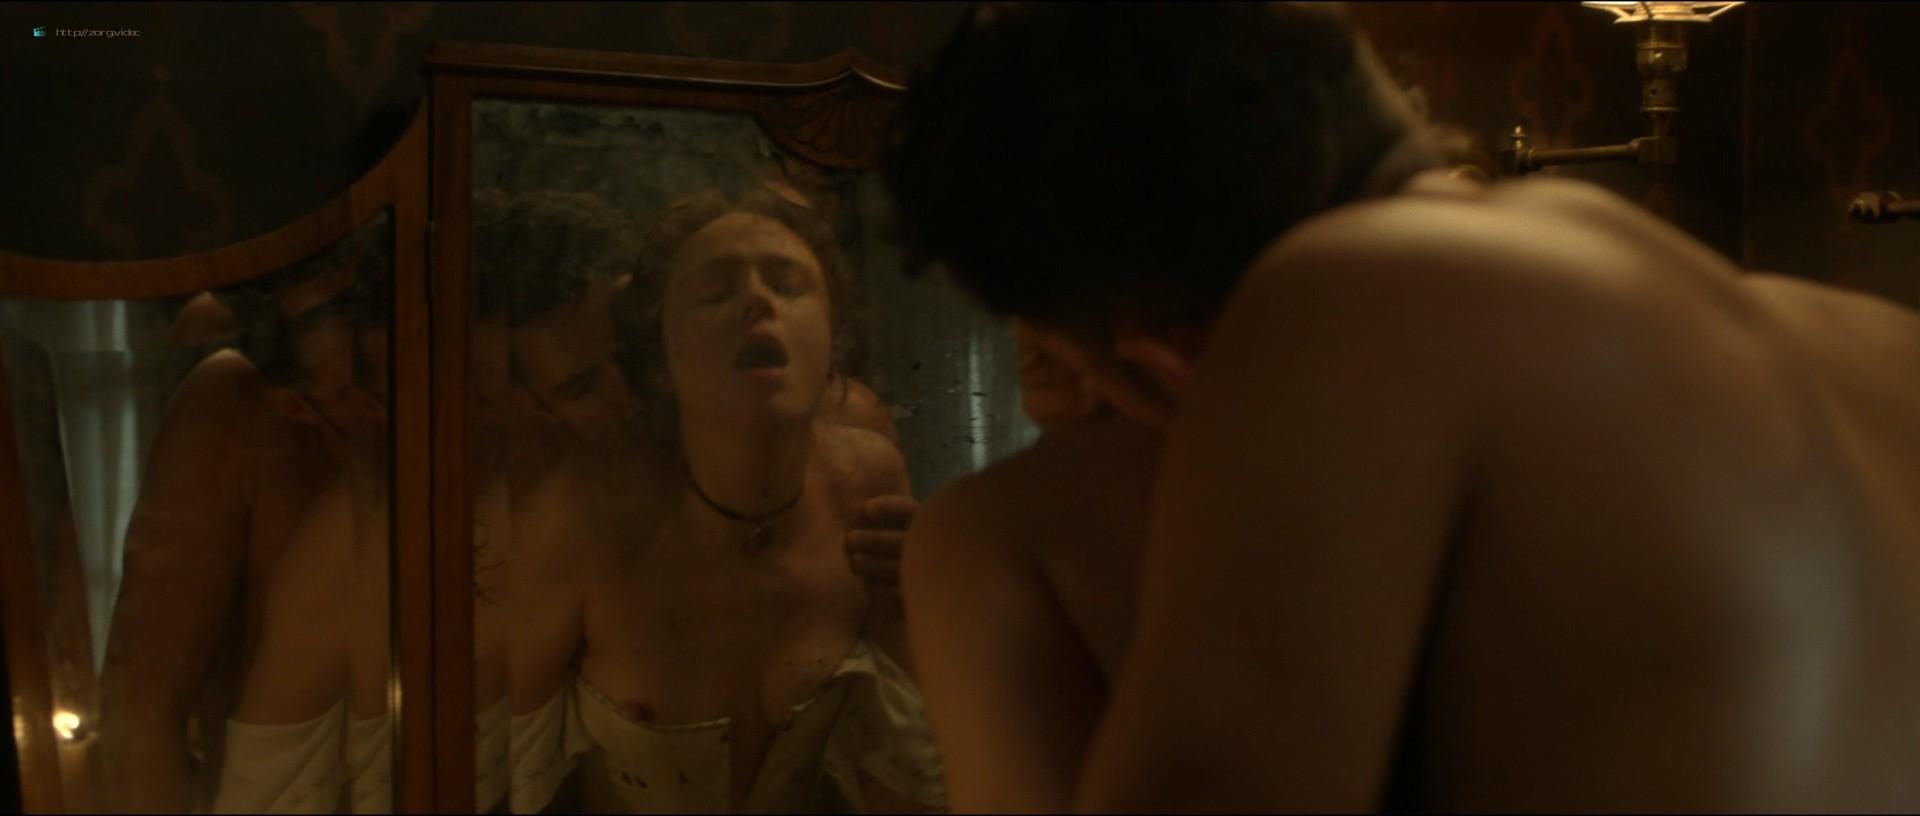 Maeve Dermody nude sex Karla Crome nude too - Carnival Row (2019) s1e1 HD 1080p (14)